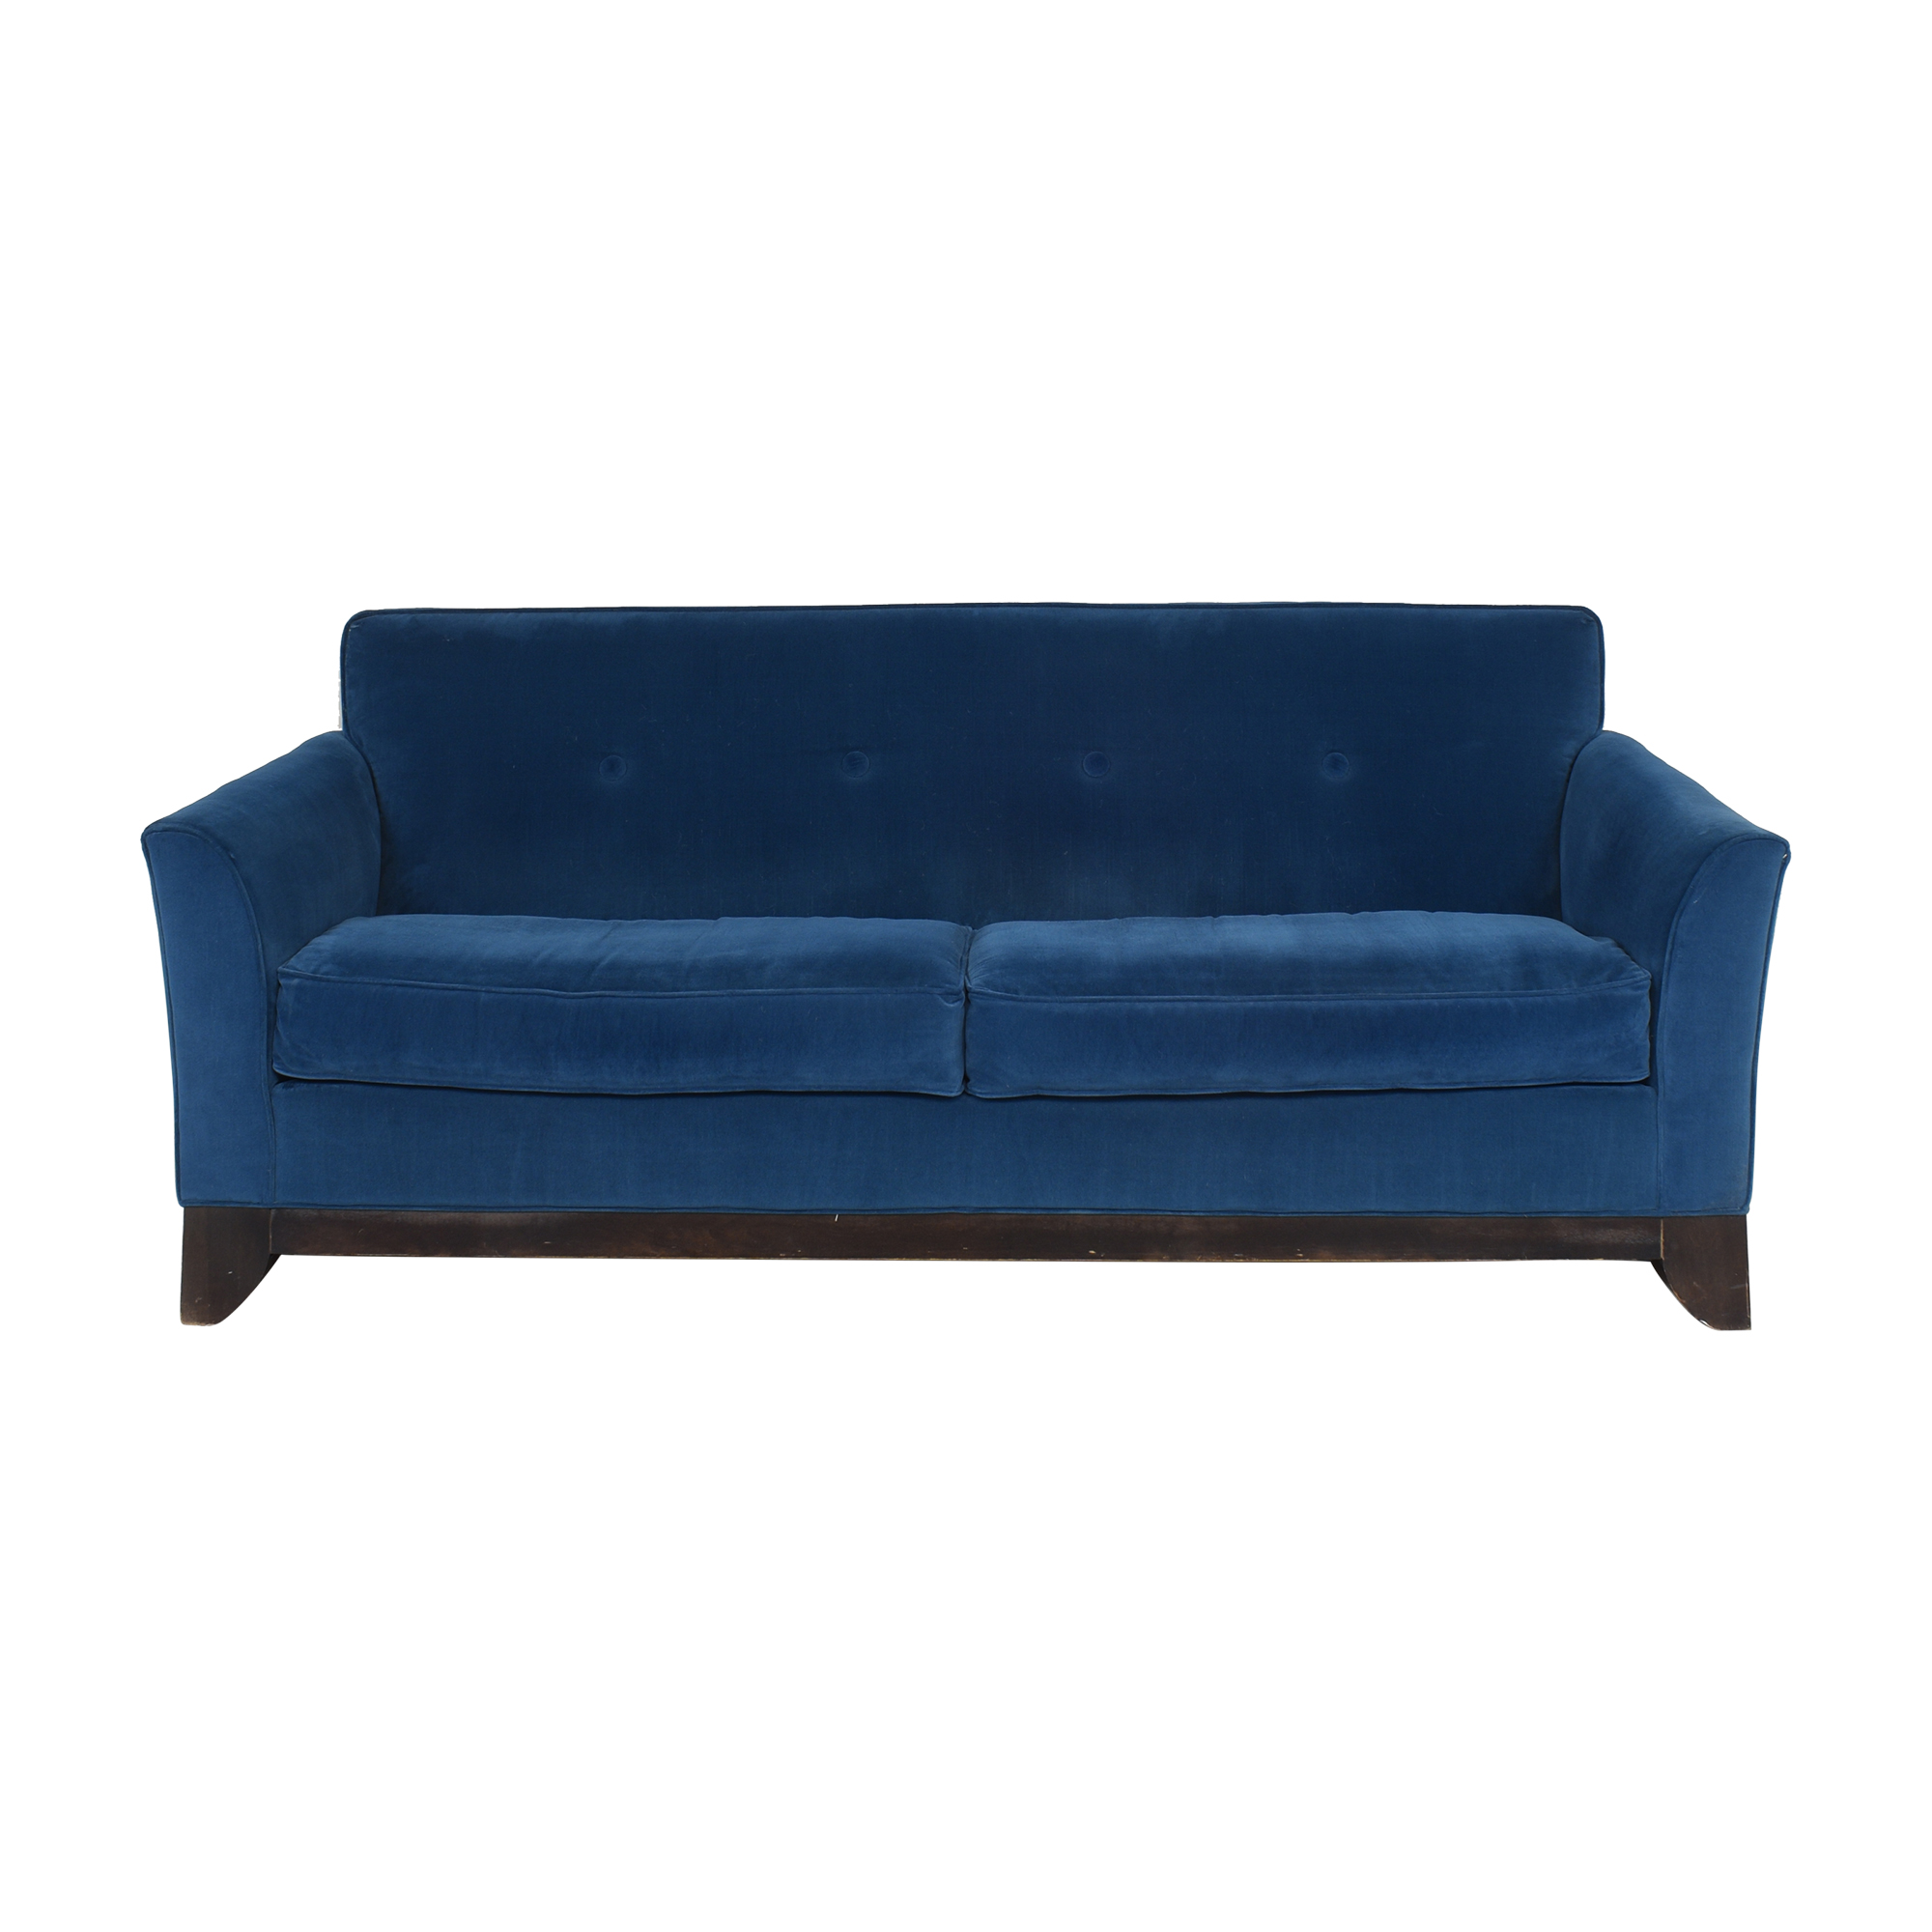 Rowe Furniture Two Cushion Sofa Rowe Furniture